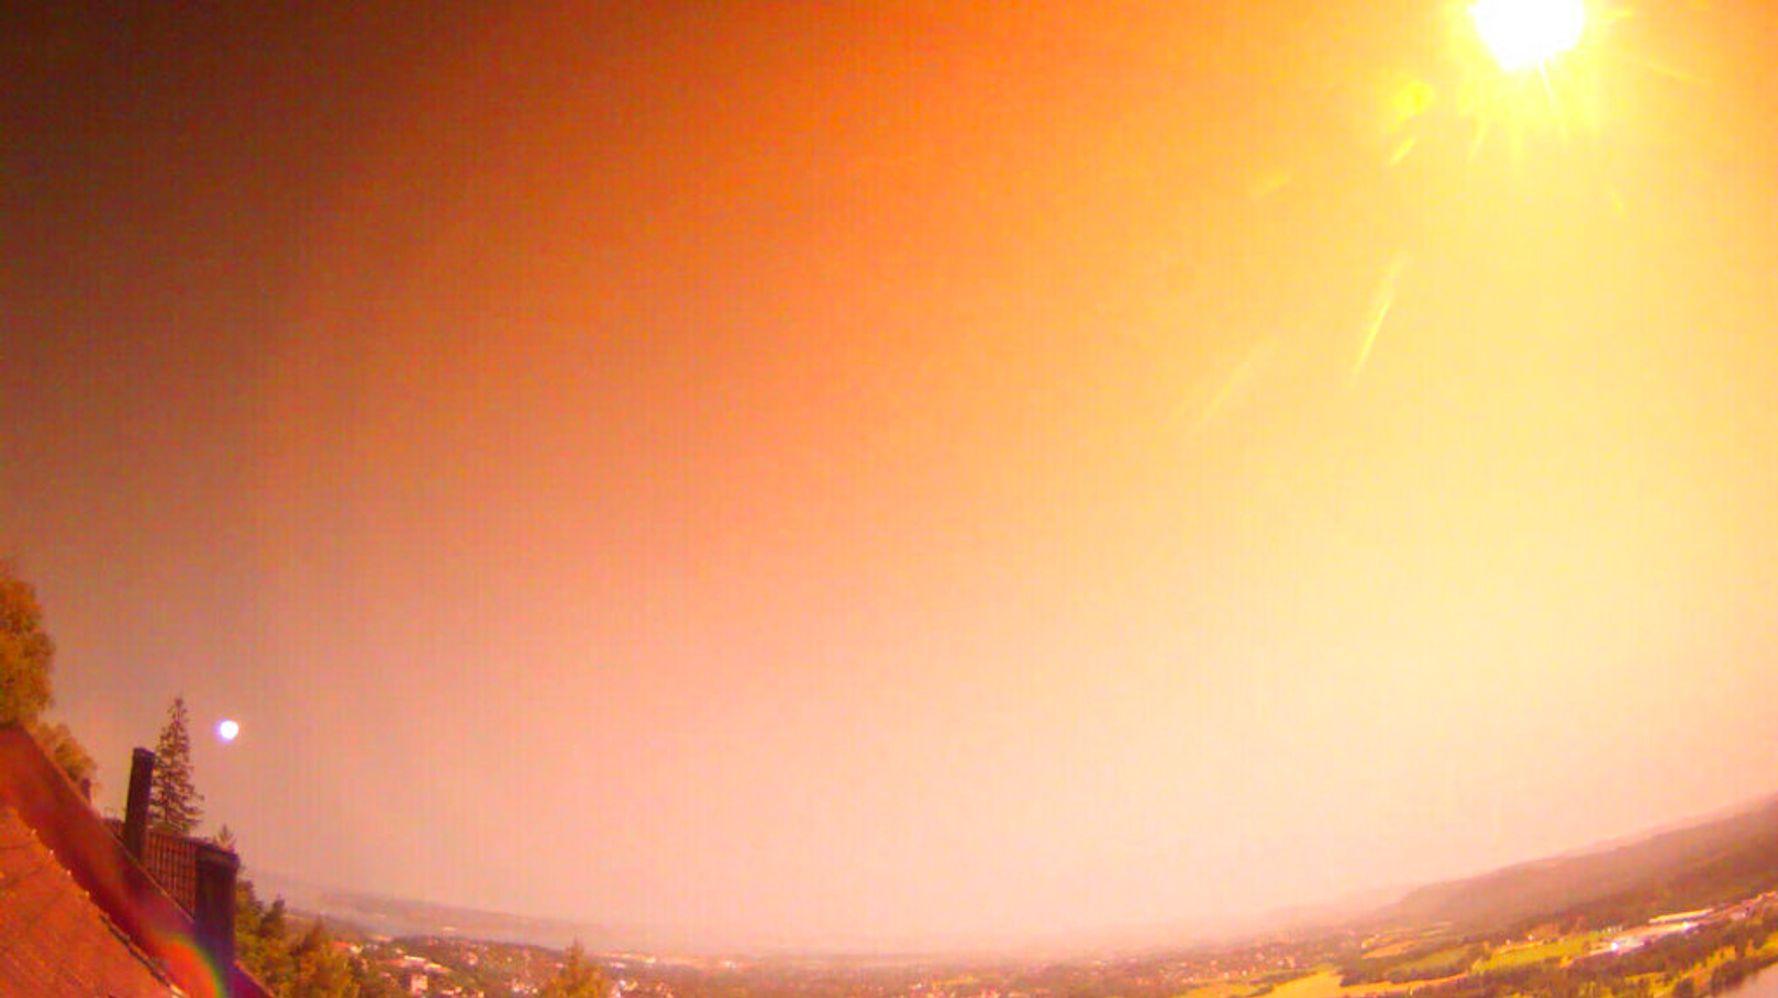 Large Meteor Lights Up Skies In Norway - HuffPost